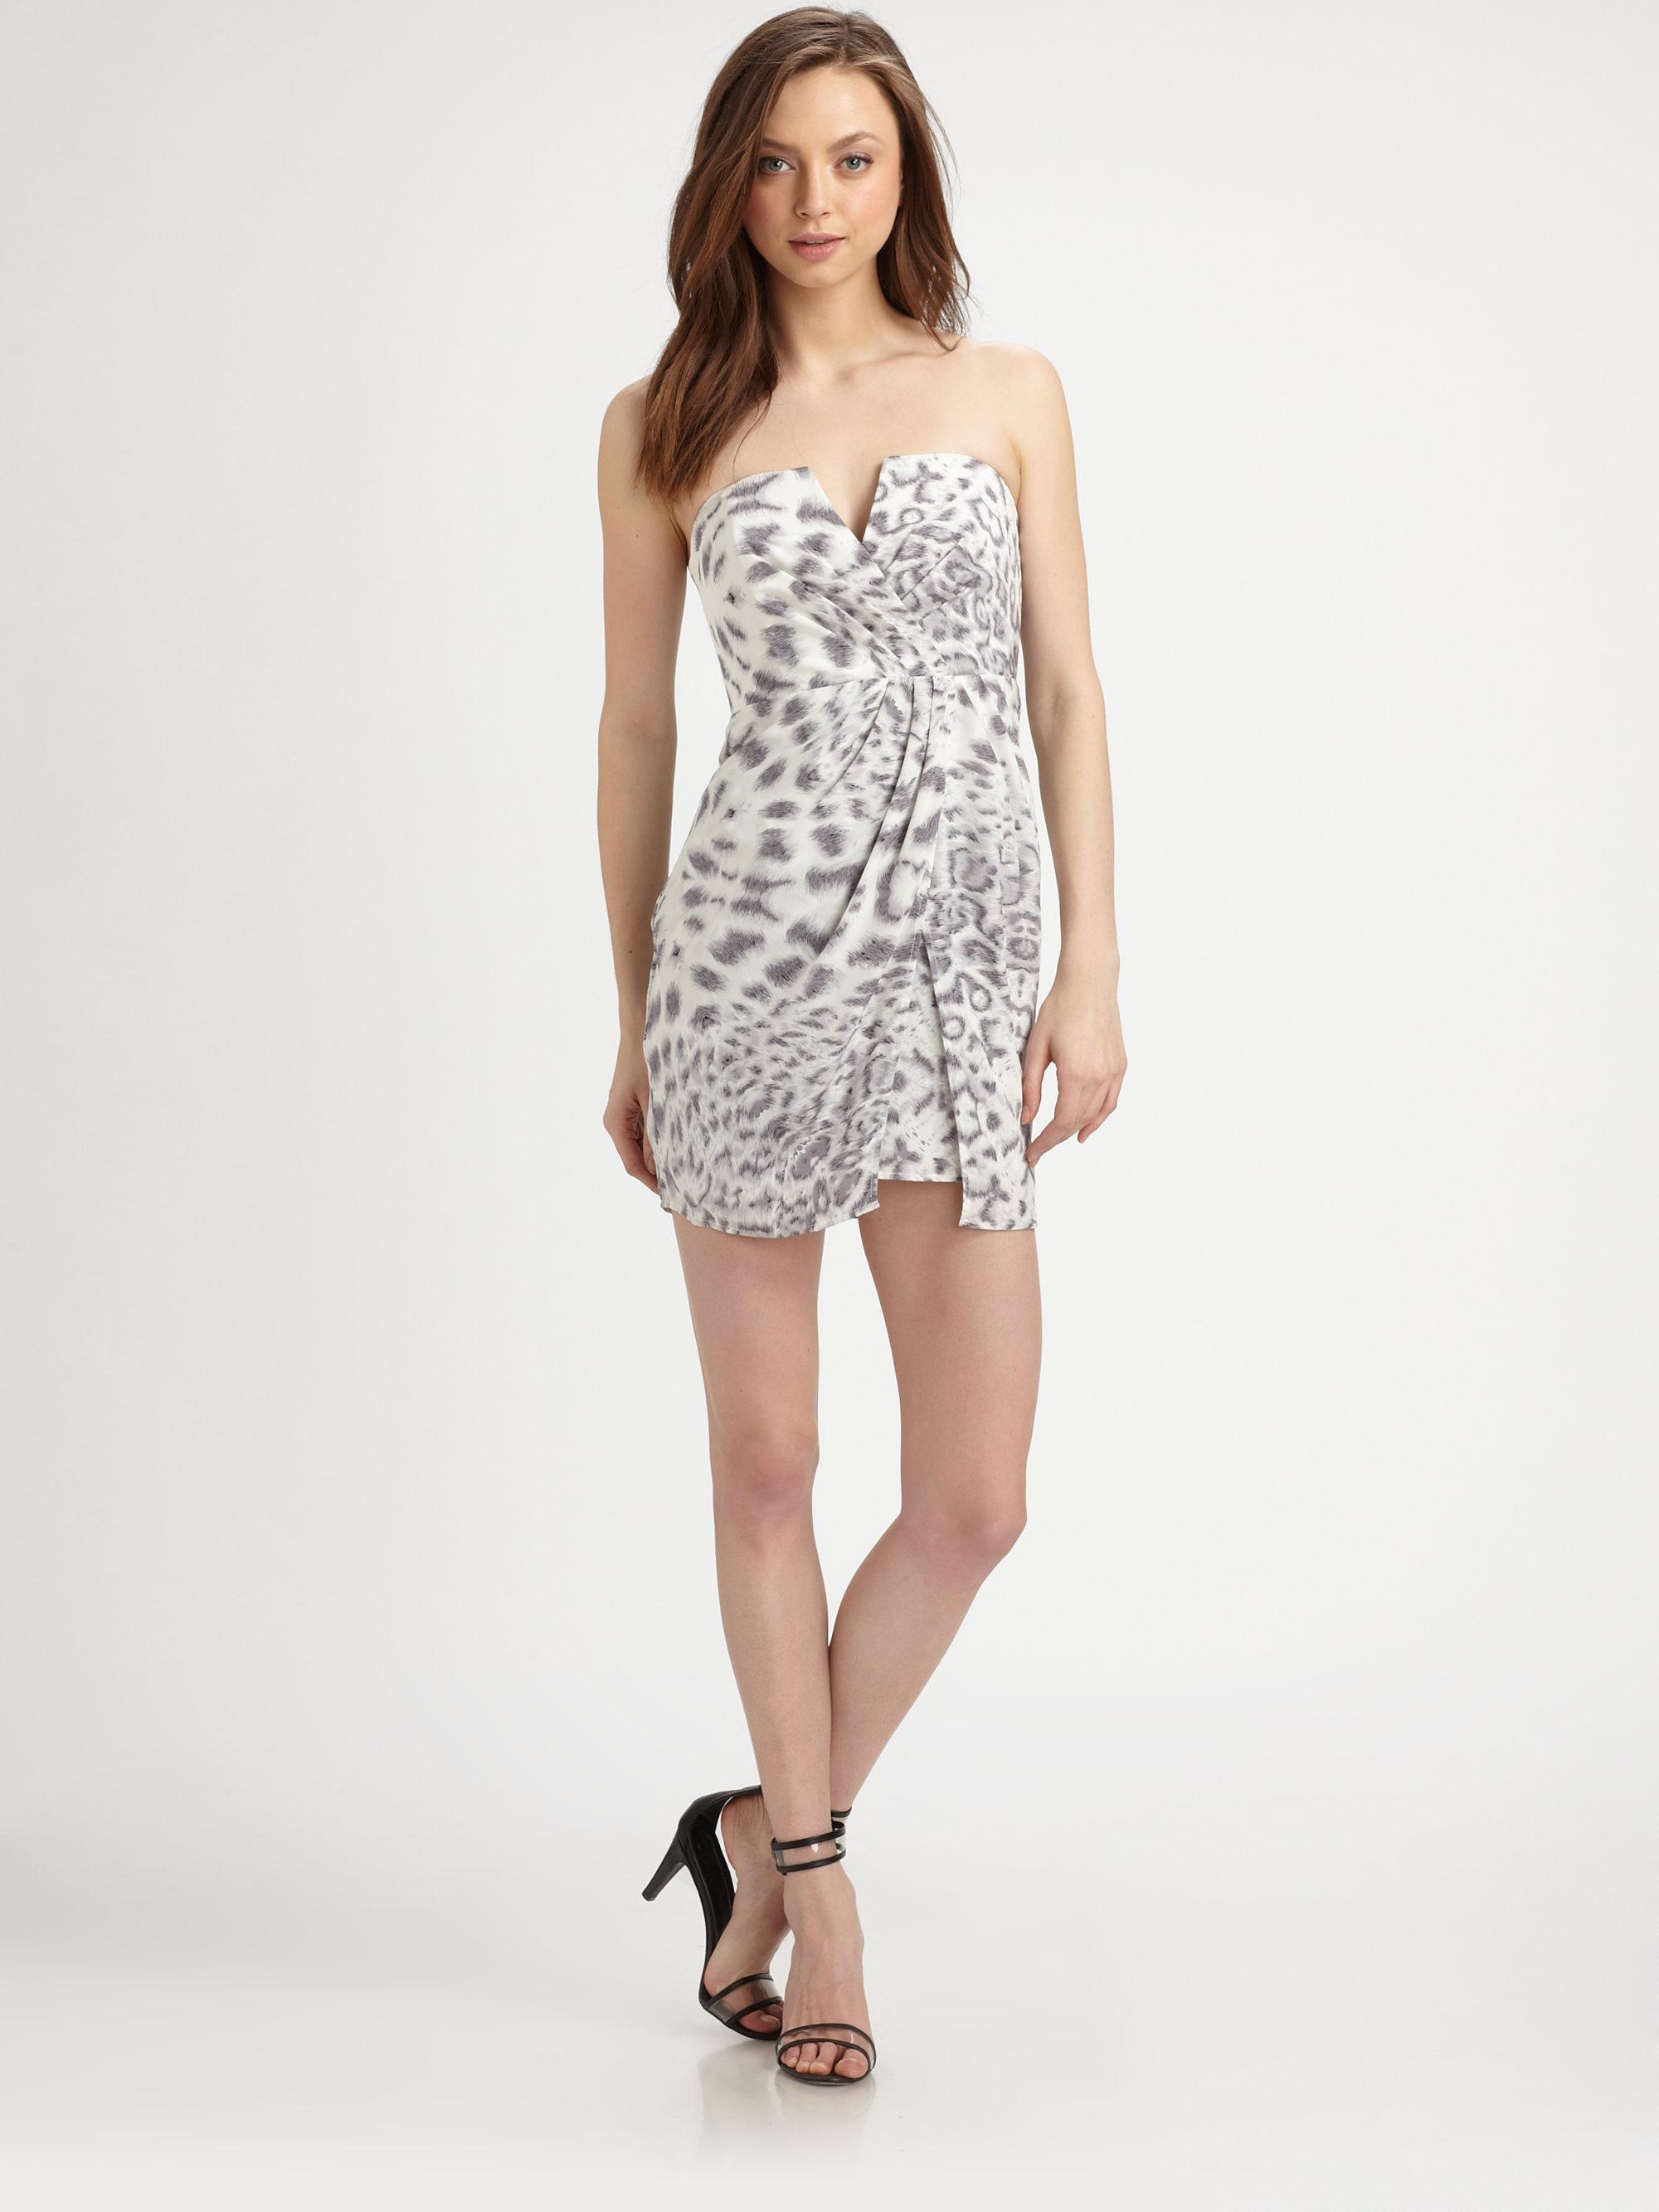 Zimmermann Silk Leopard Print Strapless Dress | Lyst